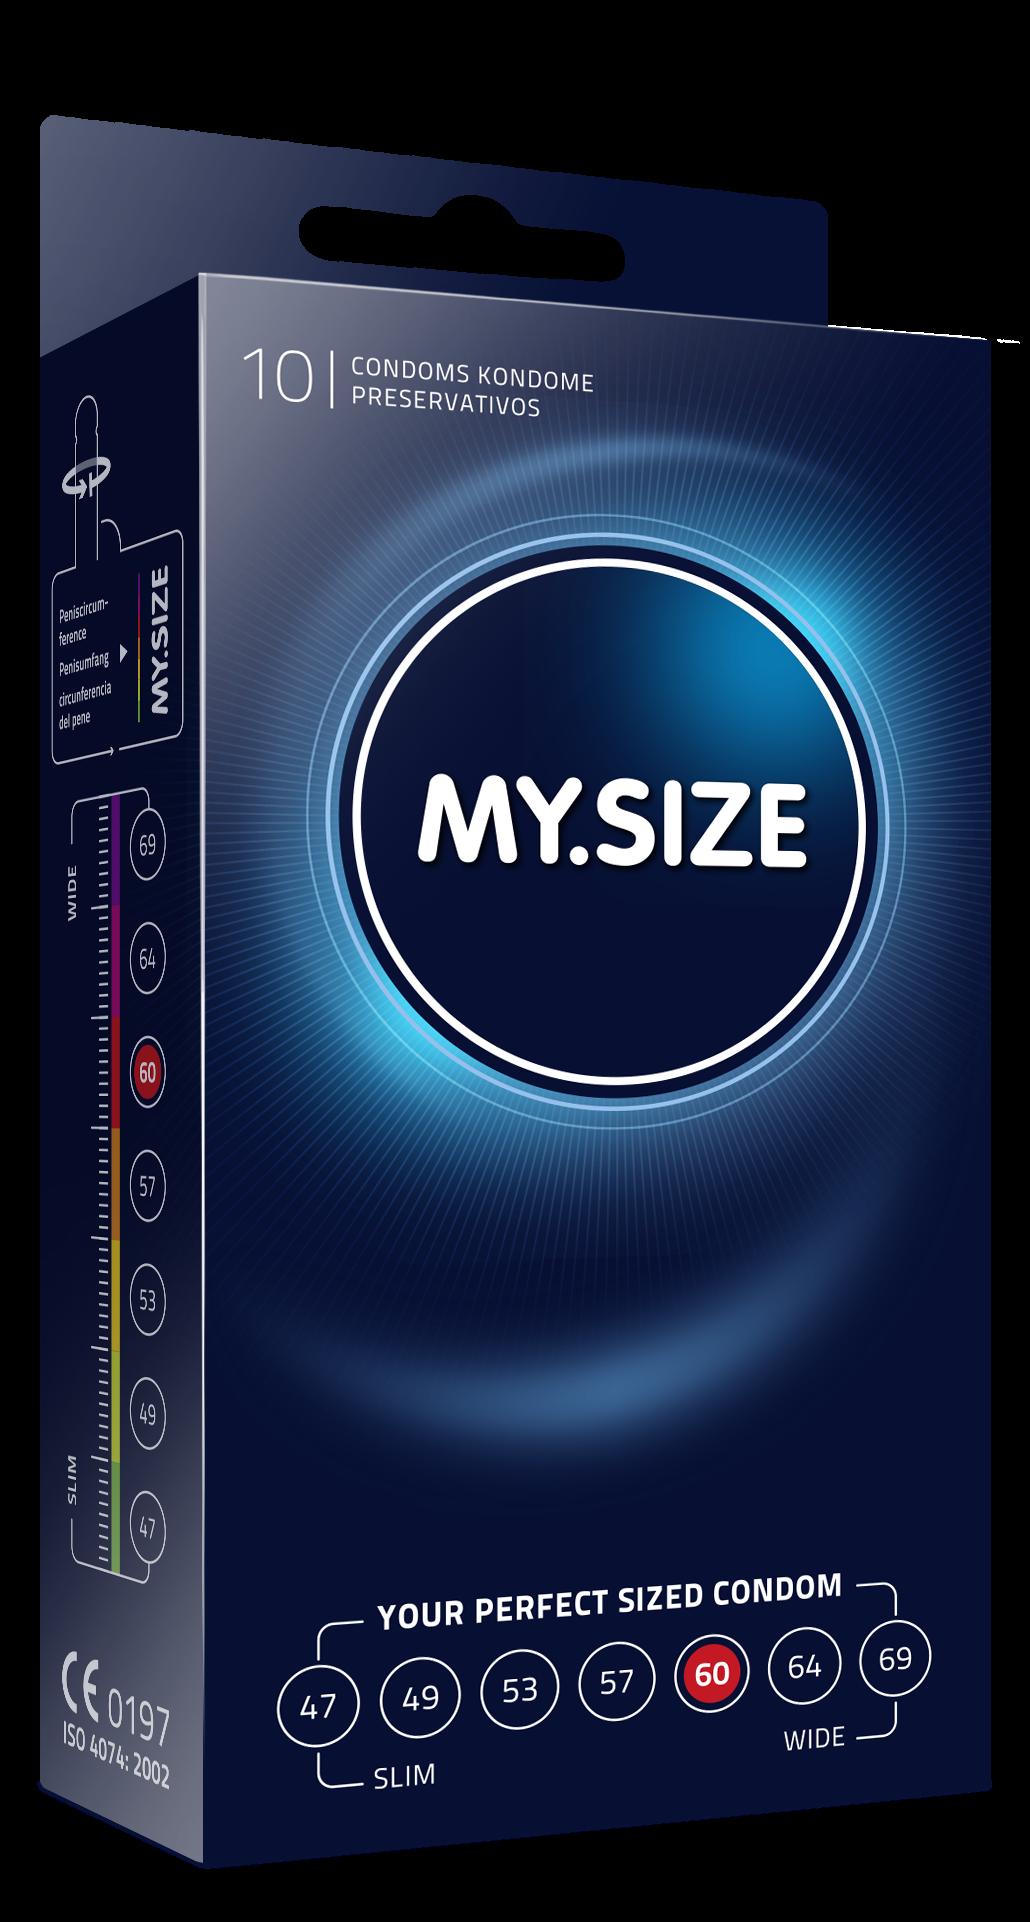 Презервативы MY.SIZE размер 60, 10 шт.